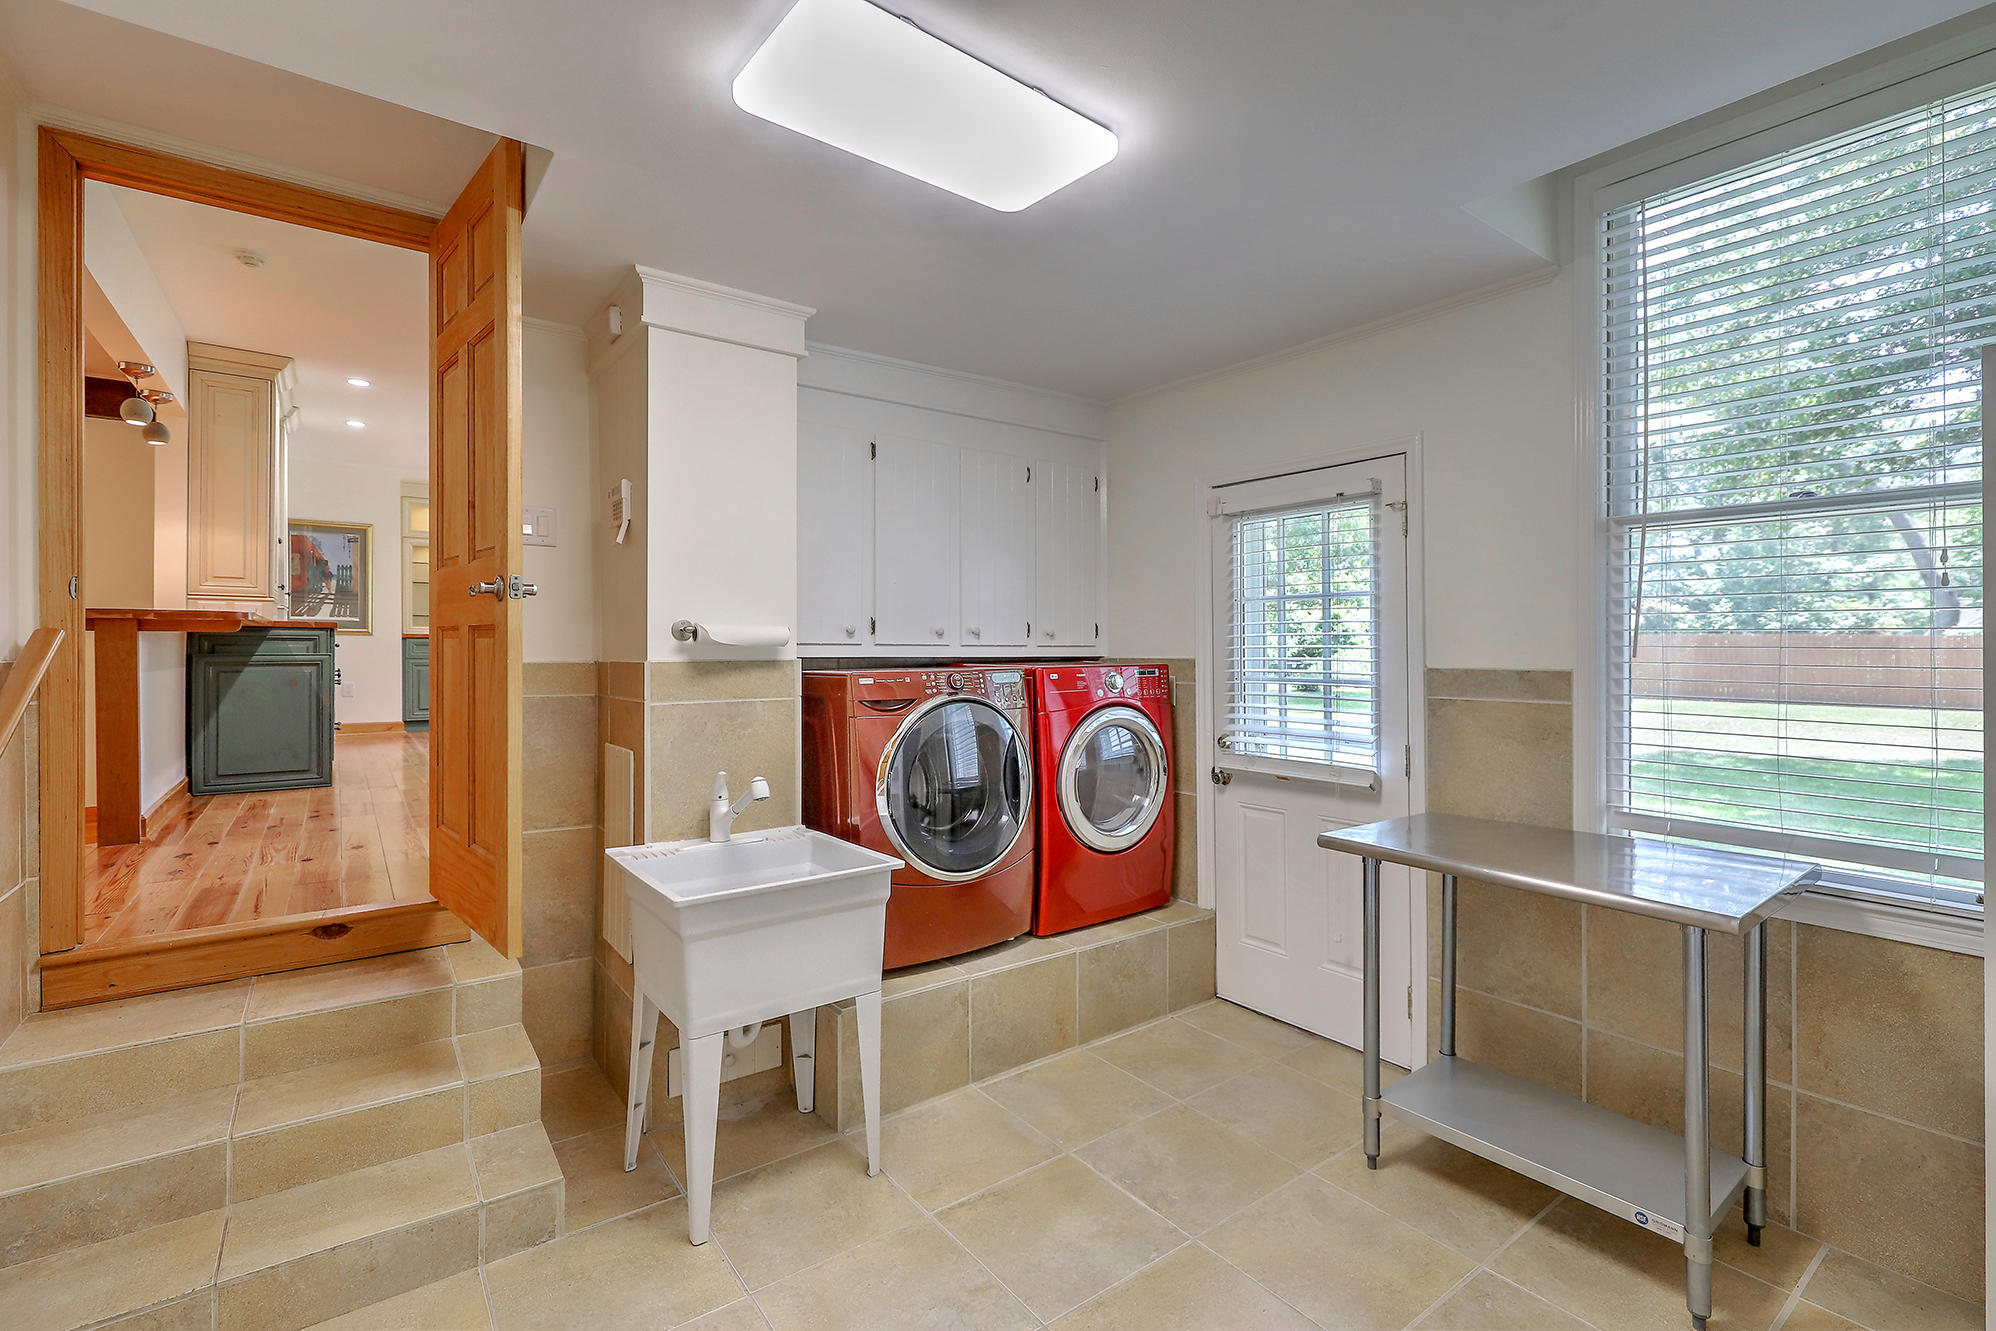 Edgewater Park Homes For Sale - 1413 Edsent, Charleston, SC - 33